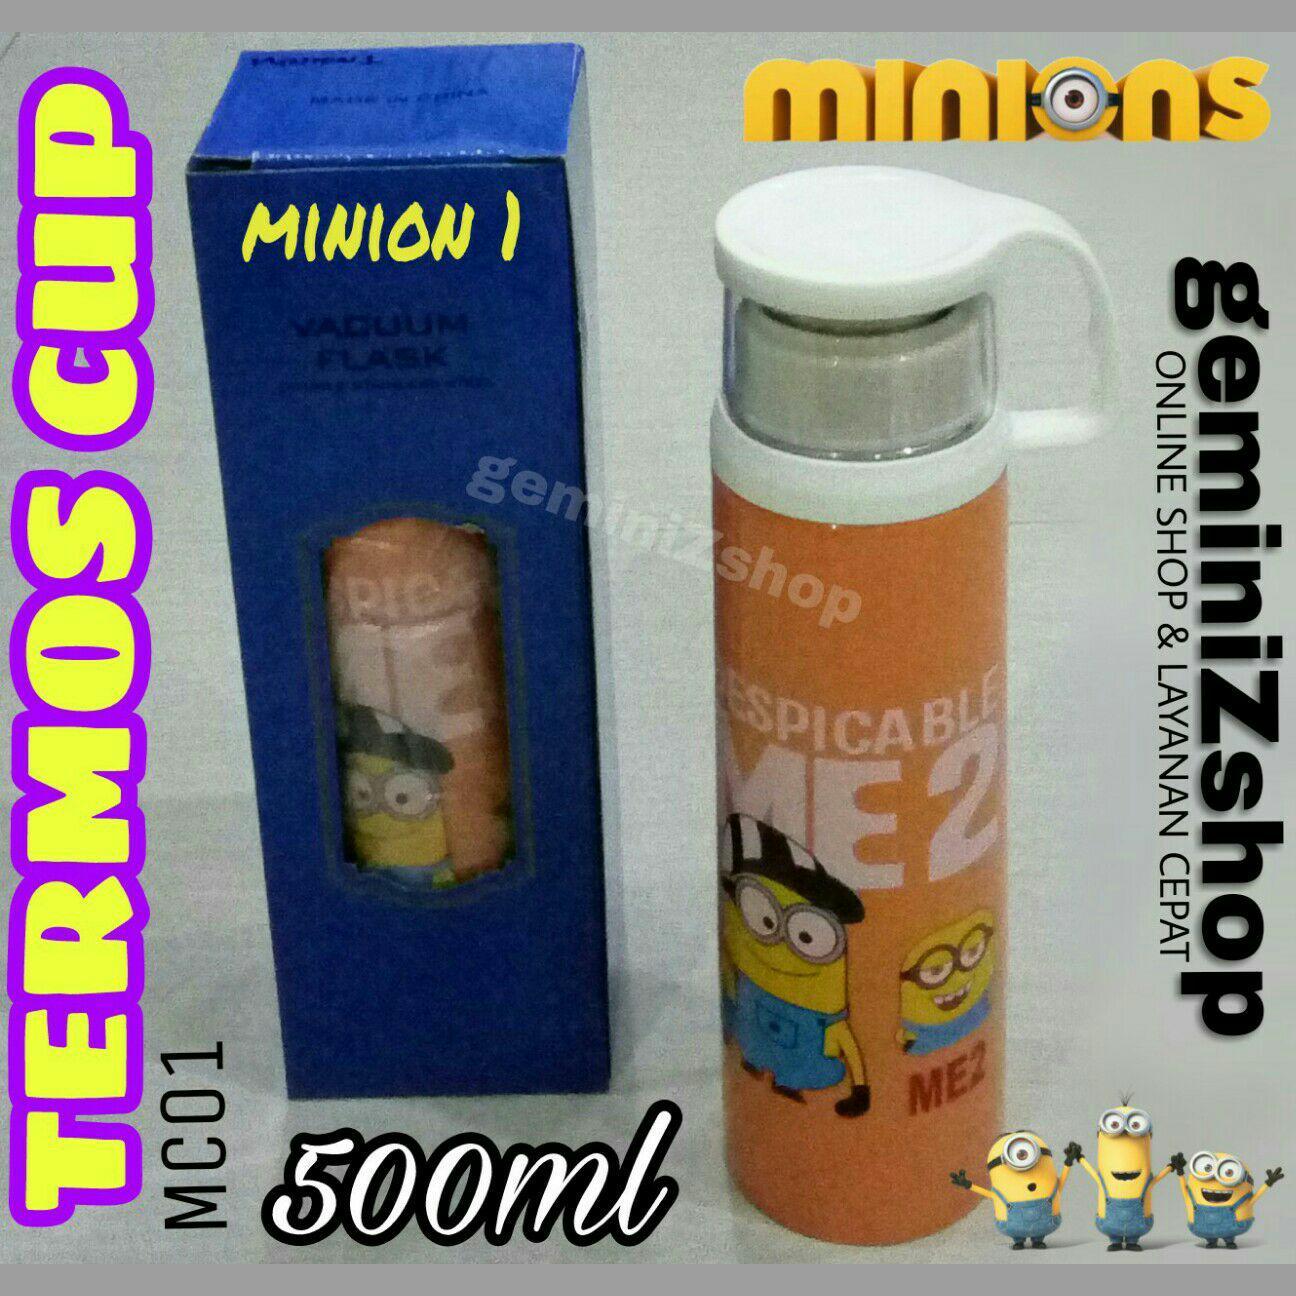 Botol Air Minum Minion Travel Cup 250ml Daftar Harga Terbaru Dan Usupso 3022 Cloth Set Insulated Glass 300ml Merah Termos 500ml Mc01 Minion1